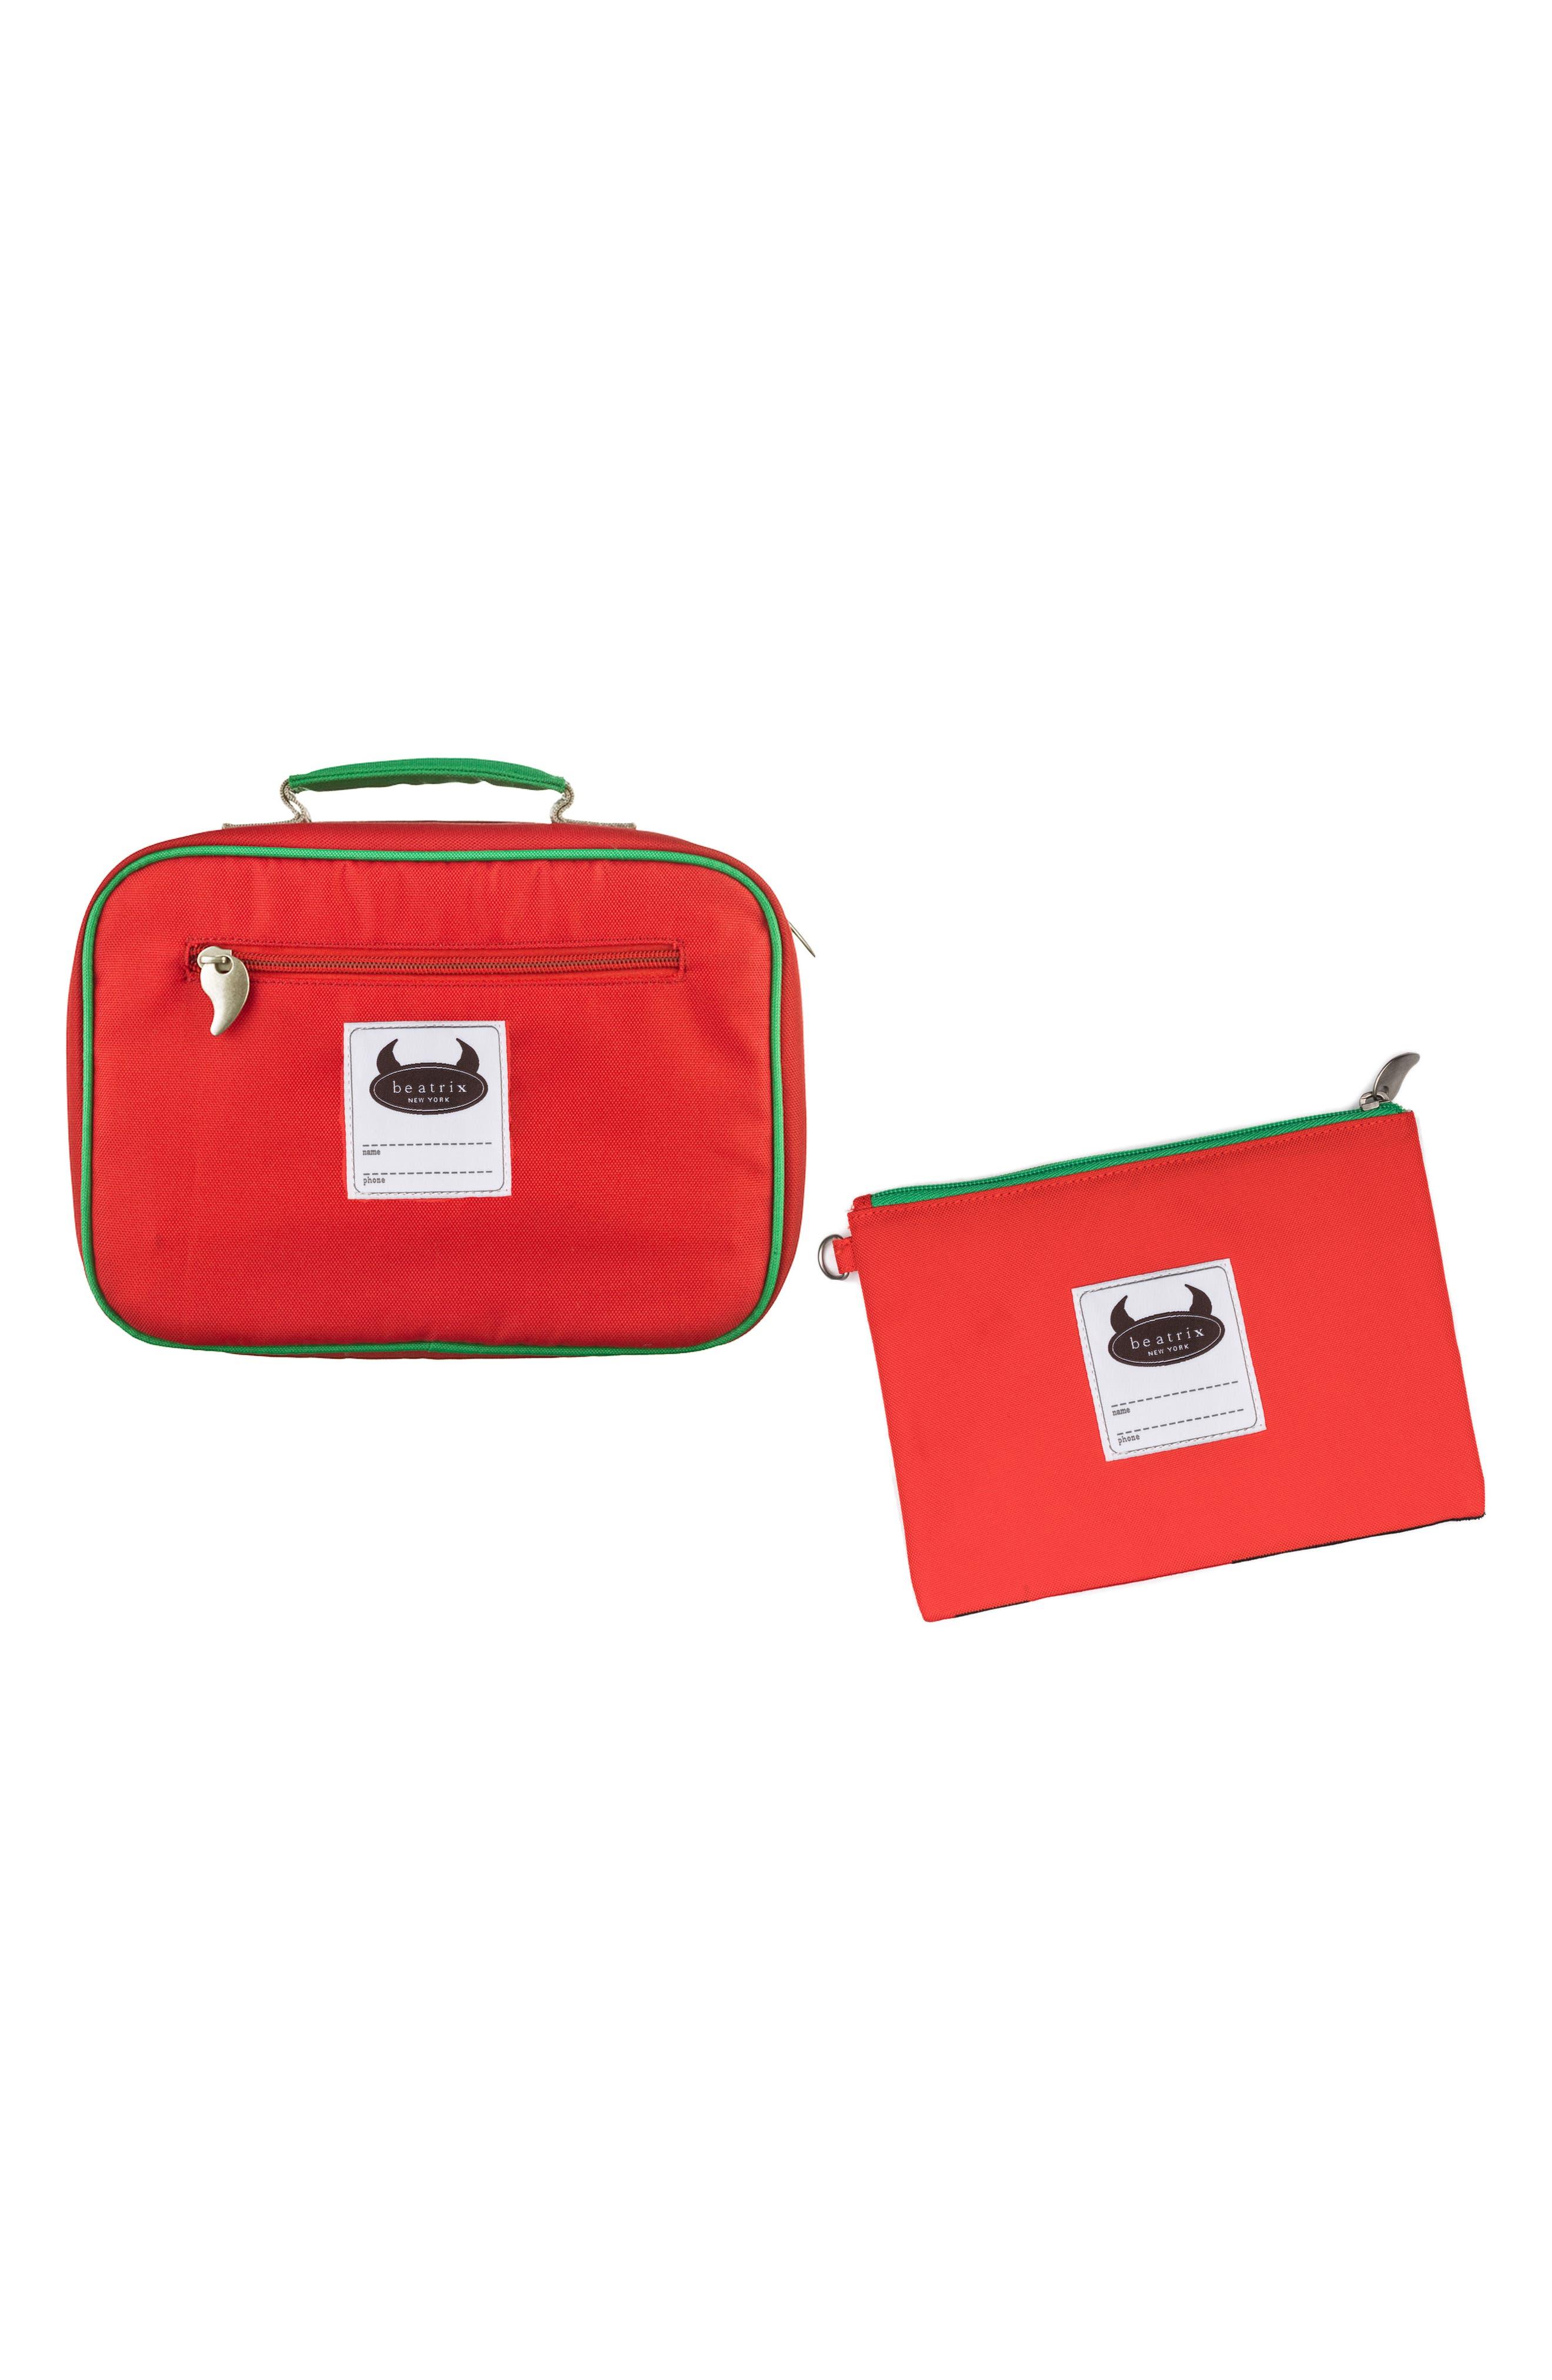 Lunch Box & Travel Pouch Set,                             Alternate thumbnail 9, color,